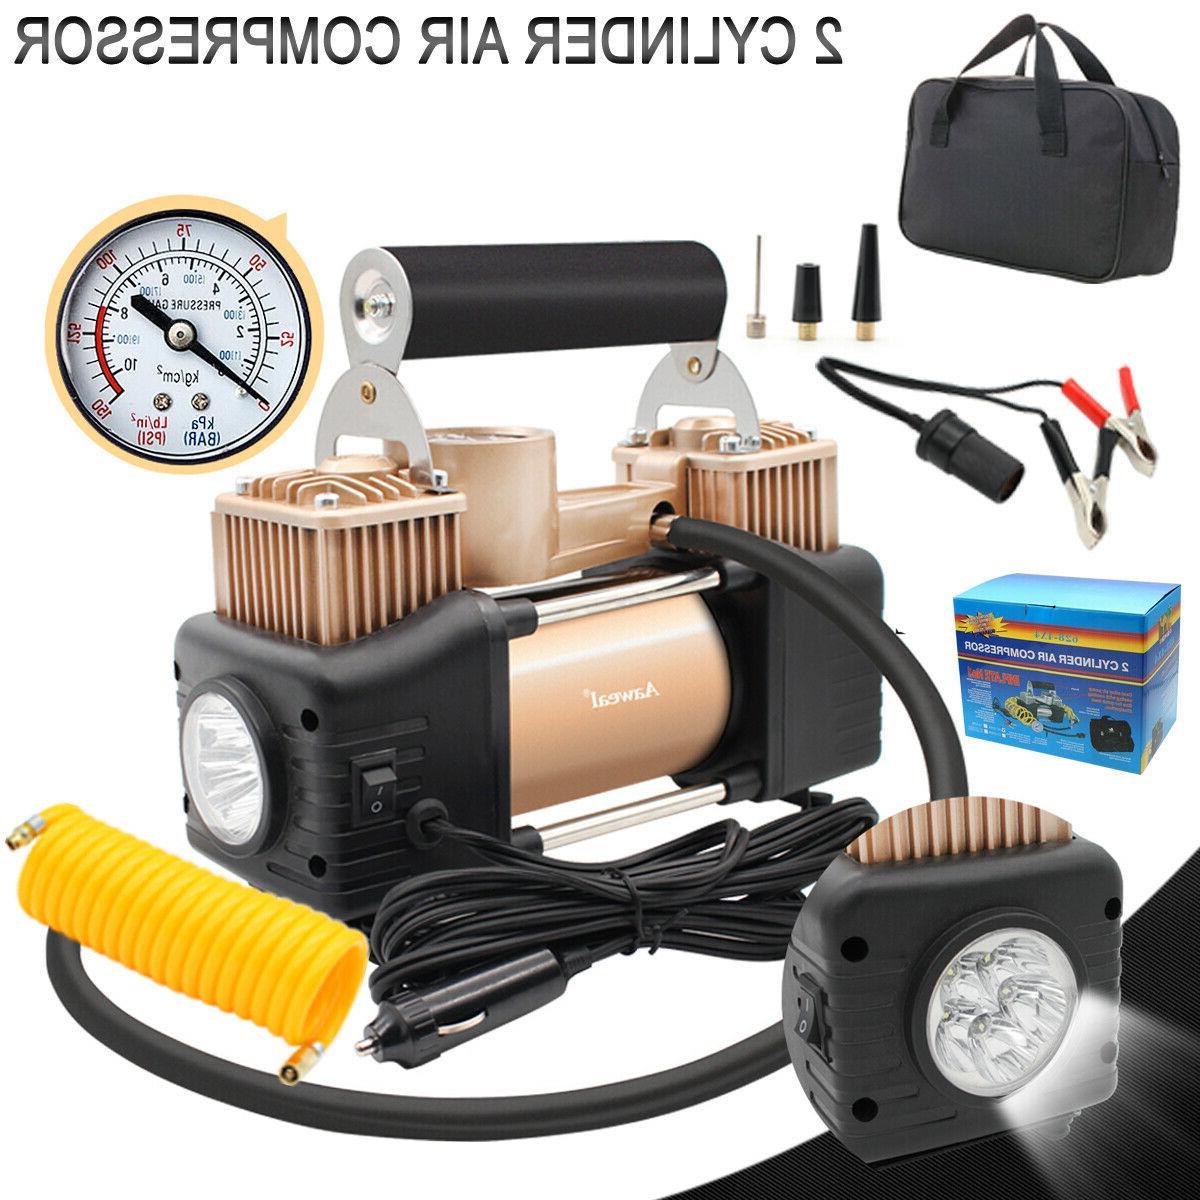 heavy duty portable air compressor for car